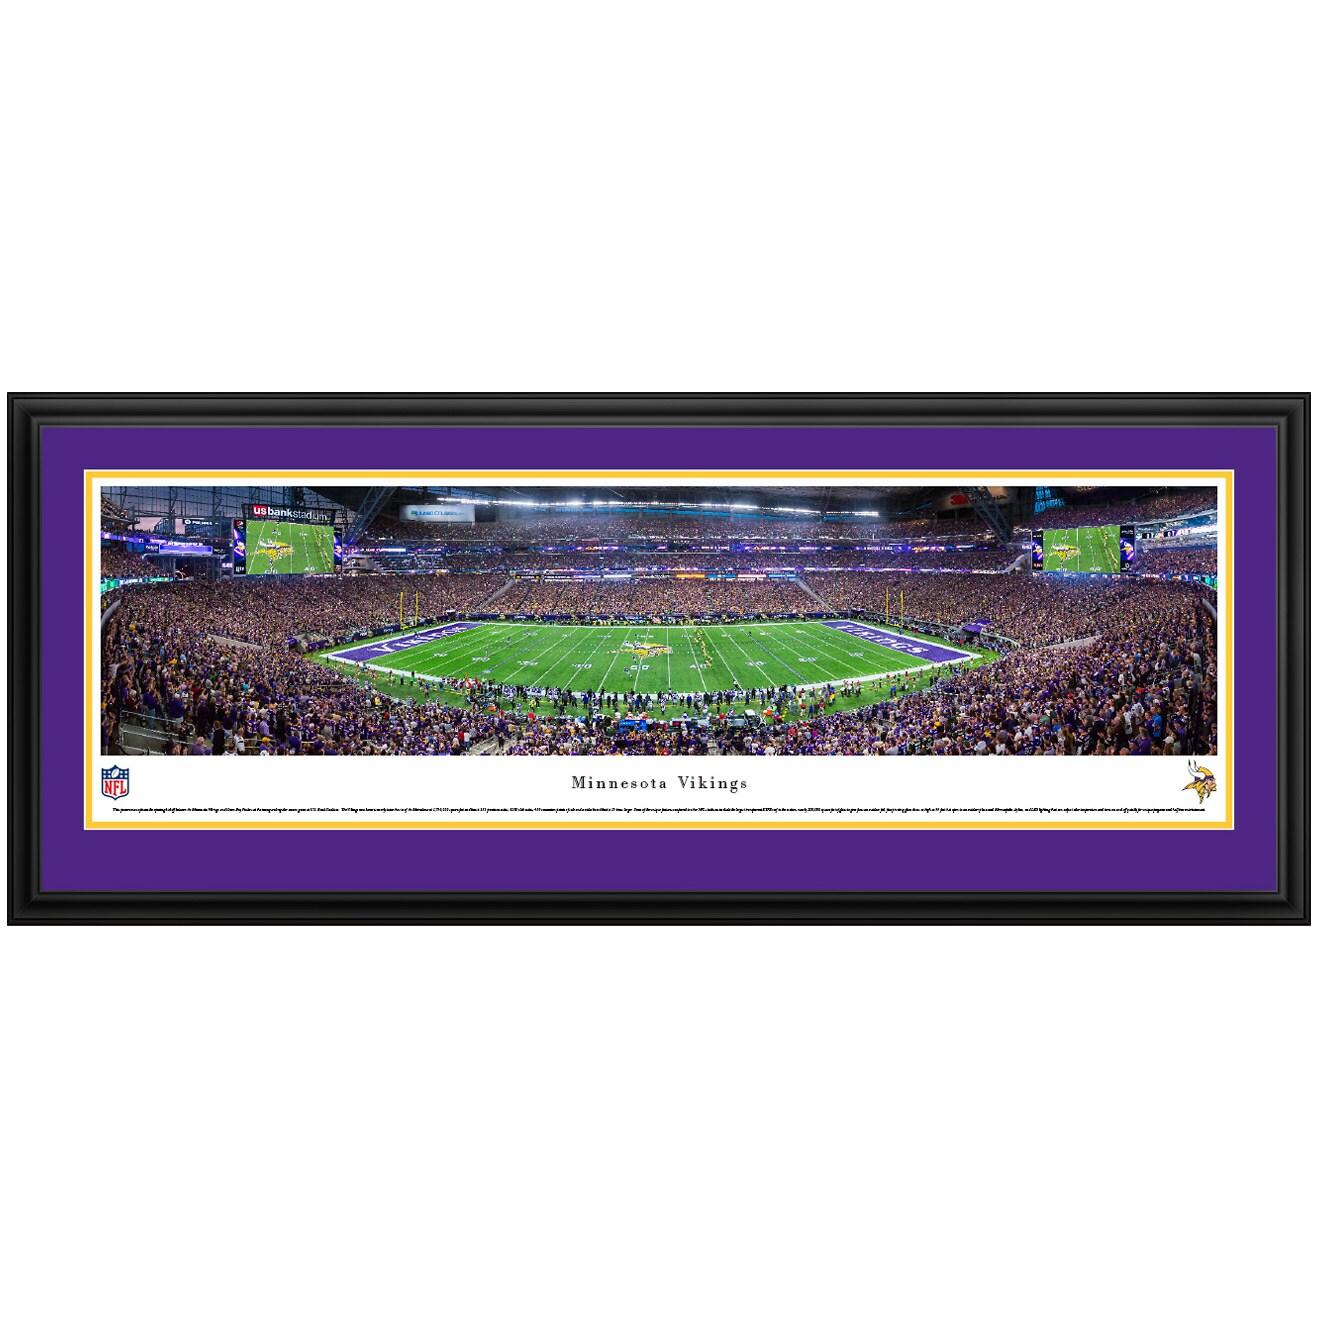 "Minnesota Vikings 44"" x 18"" Deluxe Frame Panoramic Photo"